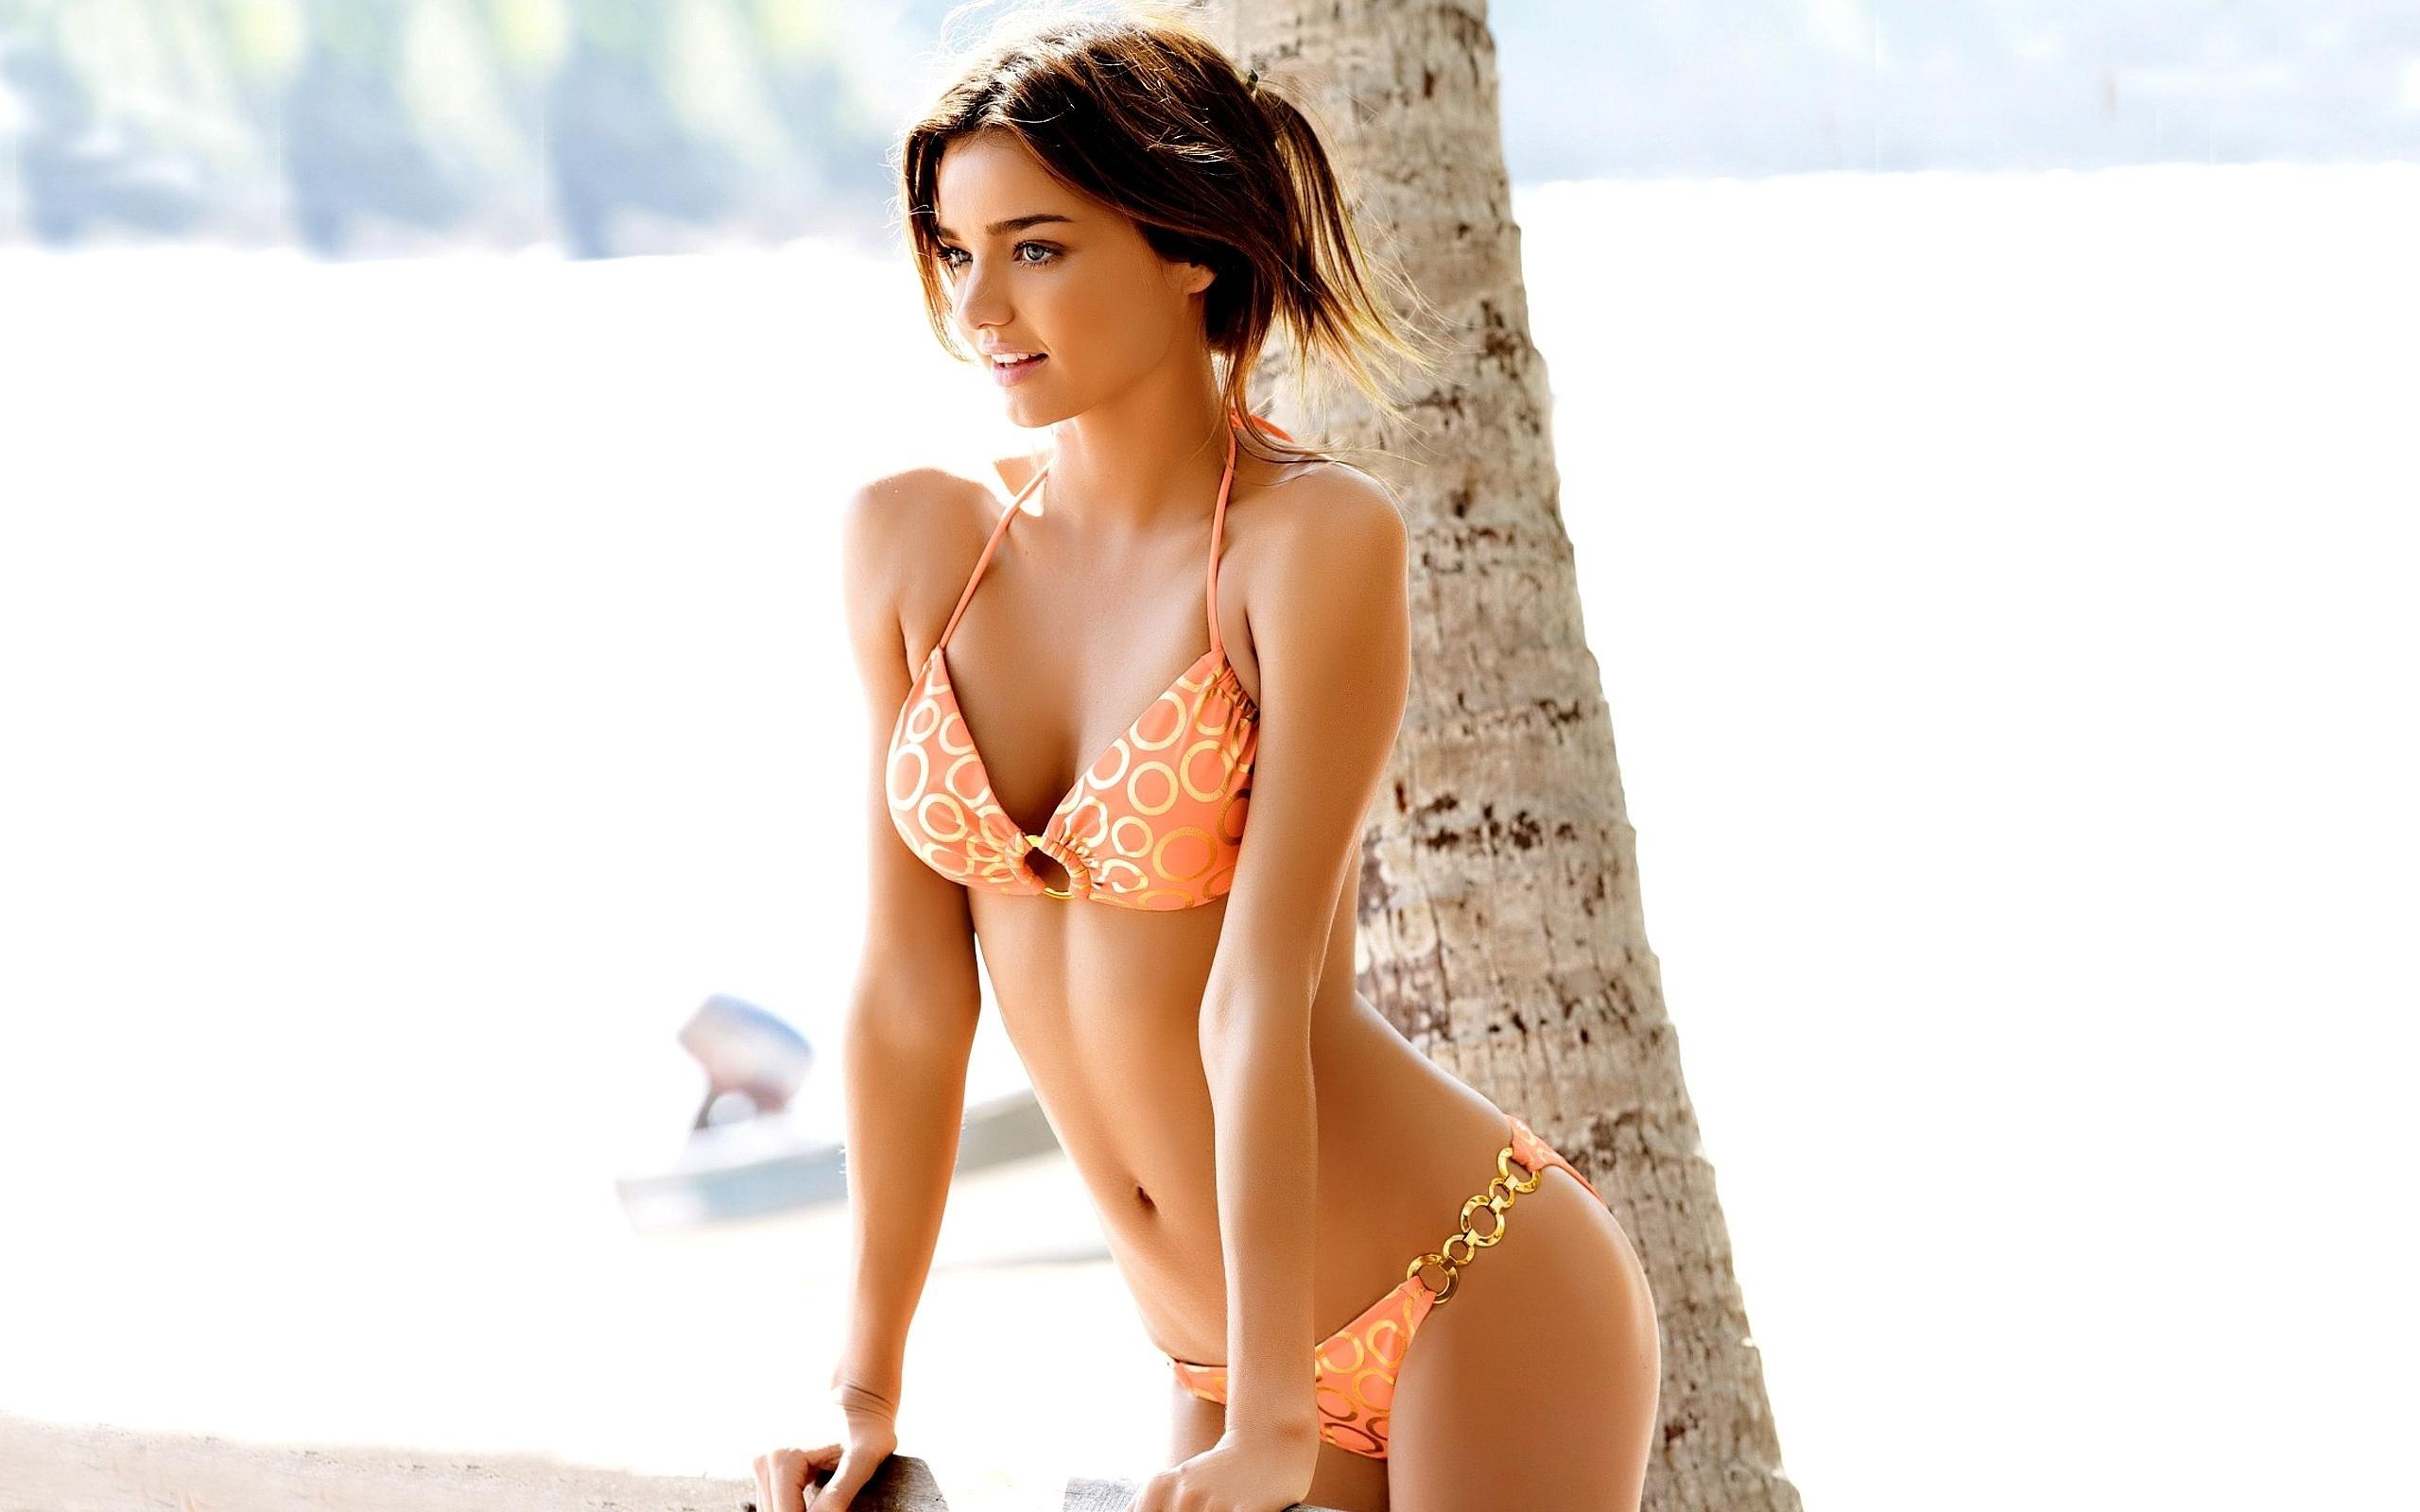 miranda kerr wallpaper sexy bikini